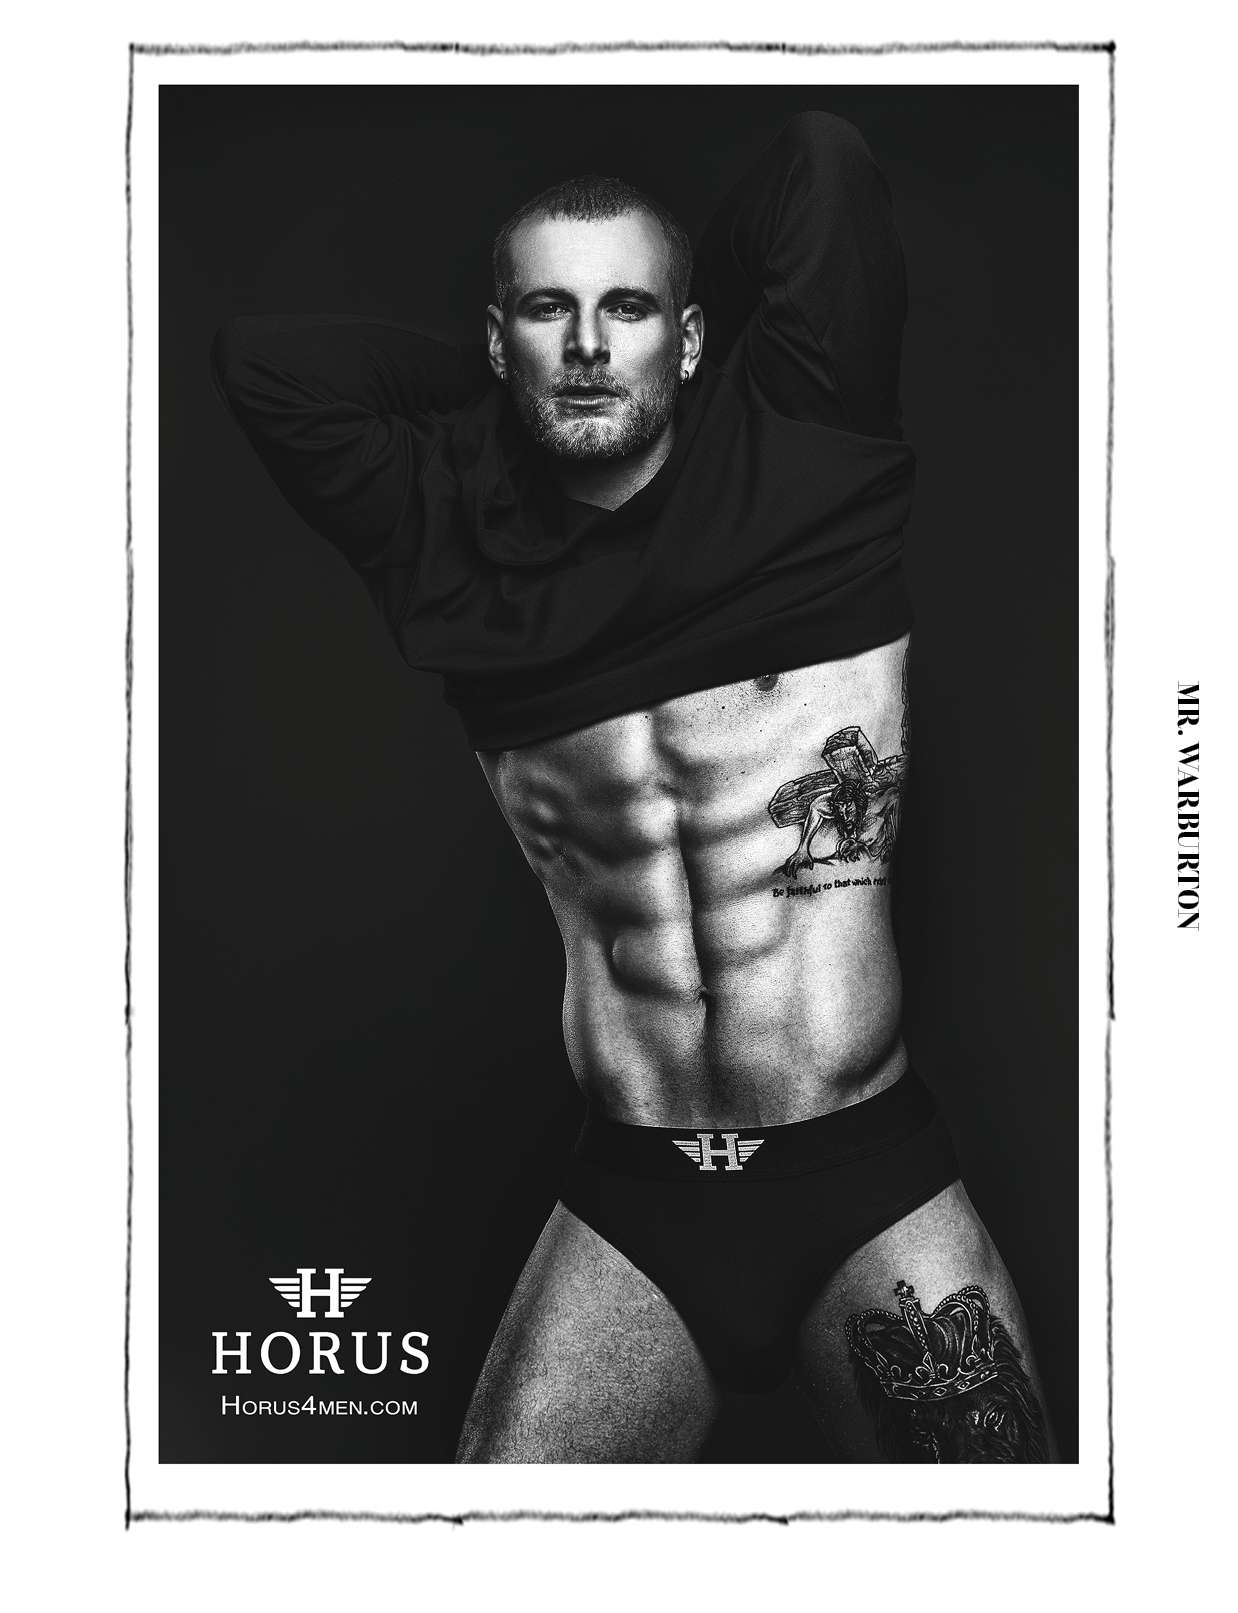 Mr. Warburton Magazine Horus4Men